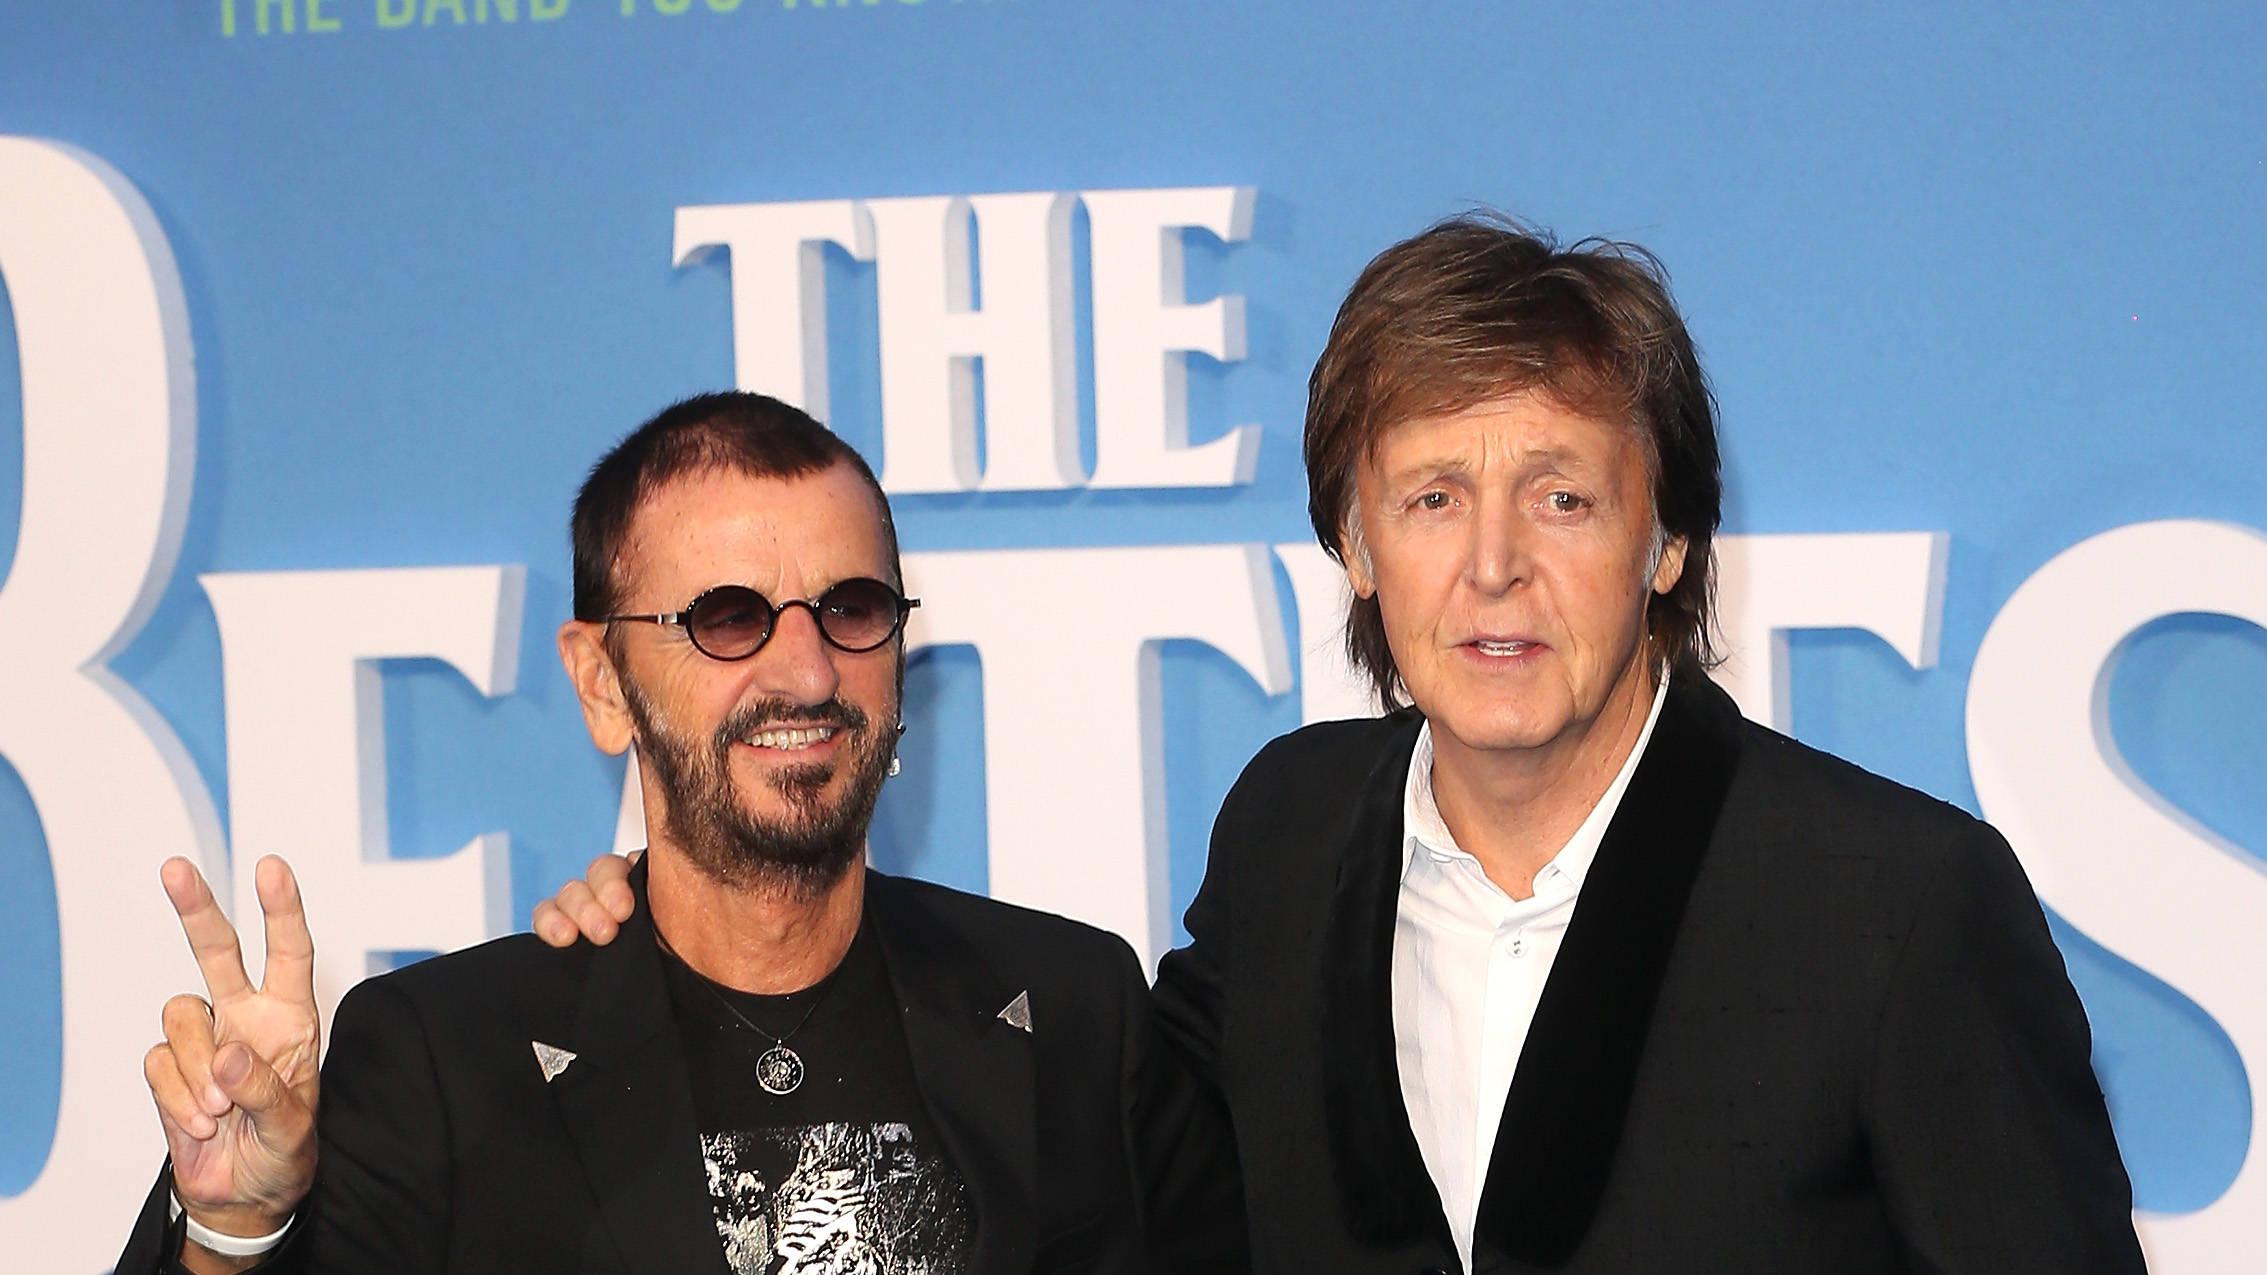 PHOTO: Paul McCartney & Ringo Starr reunite to celebrate 50 years of Abbey Road